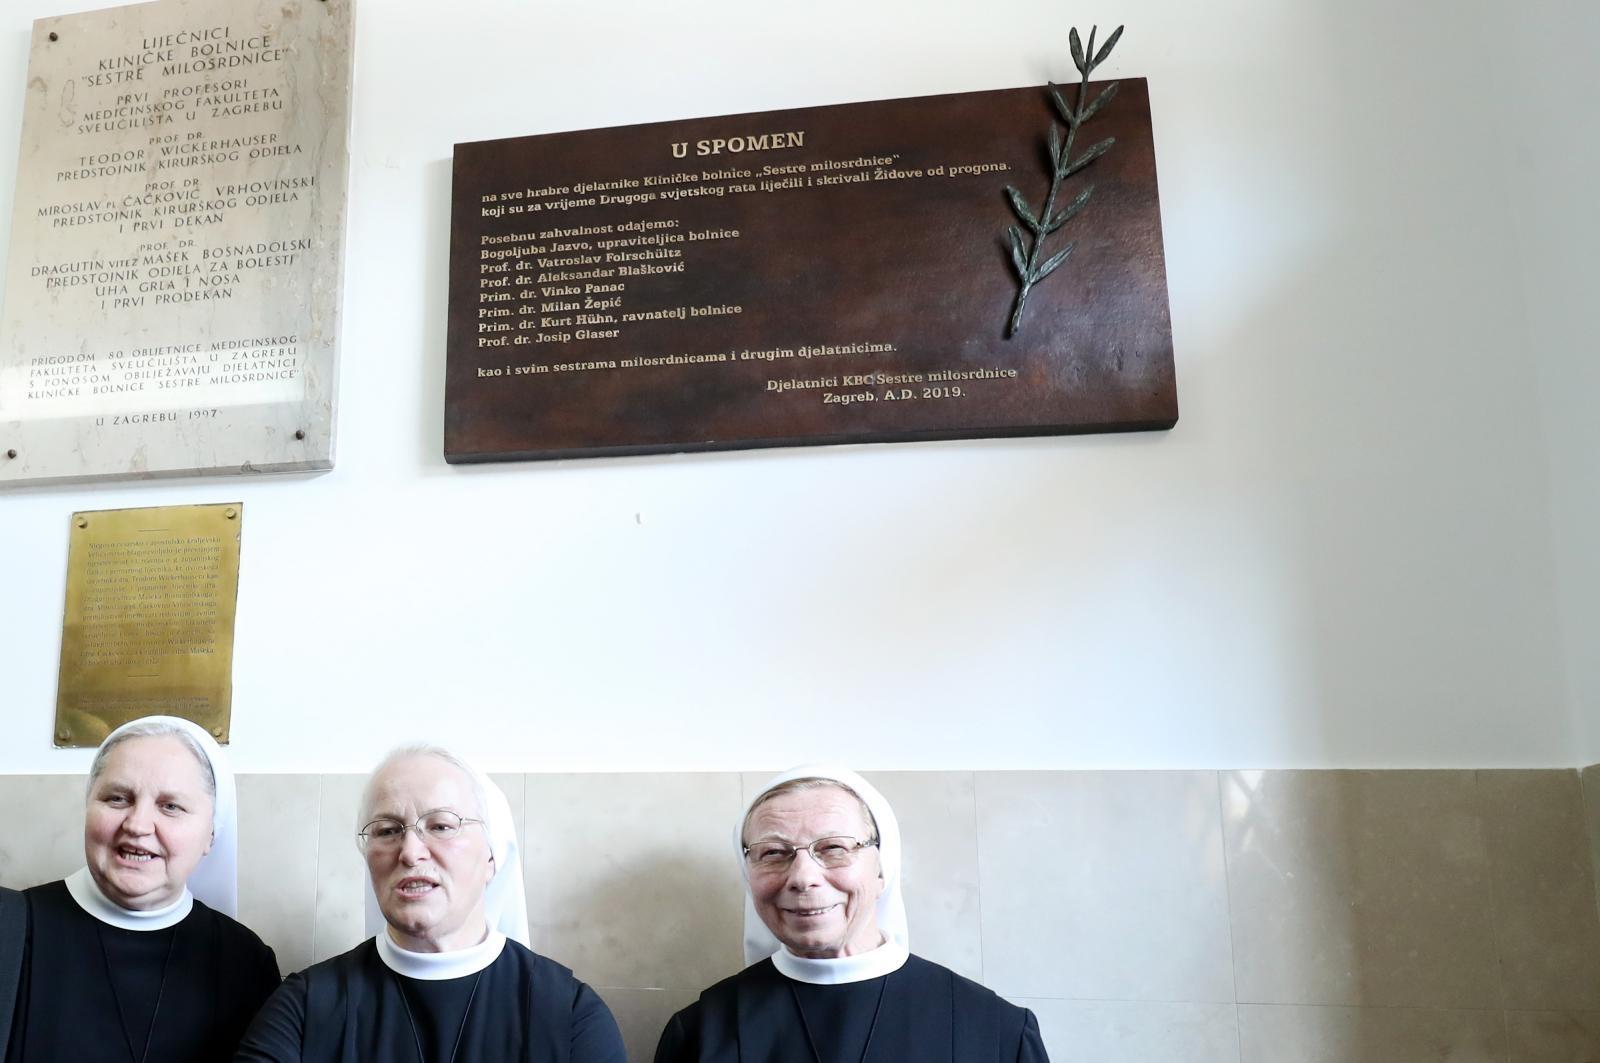 VIDEO: U KBC-u Sestre milosrdnice otkrivena spomen-ploča hrabrim liječnicima i časnim sestrama